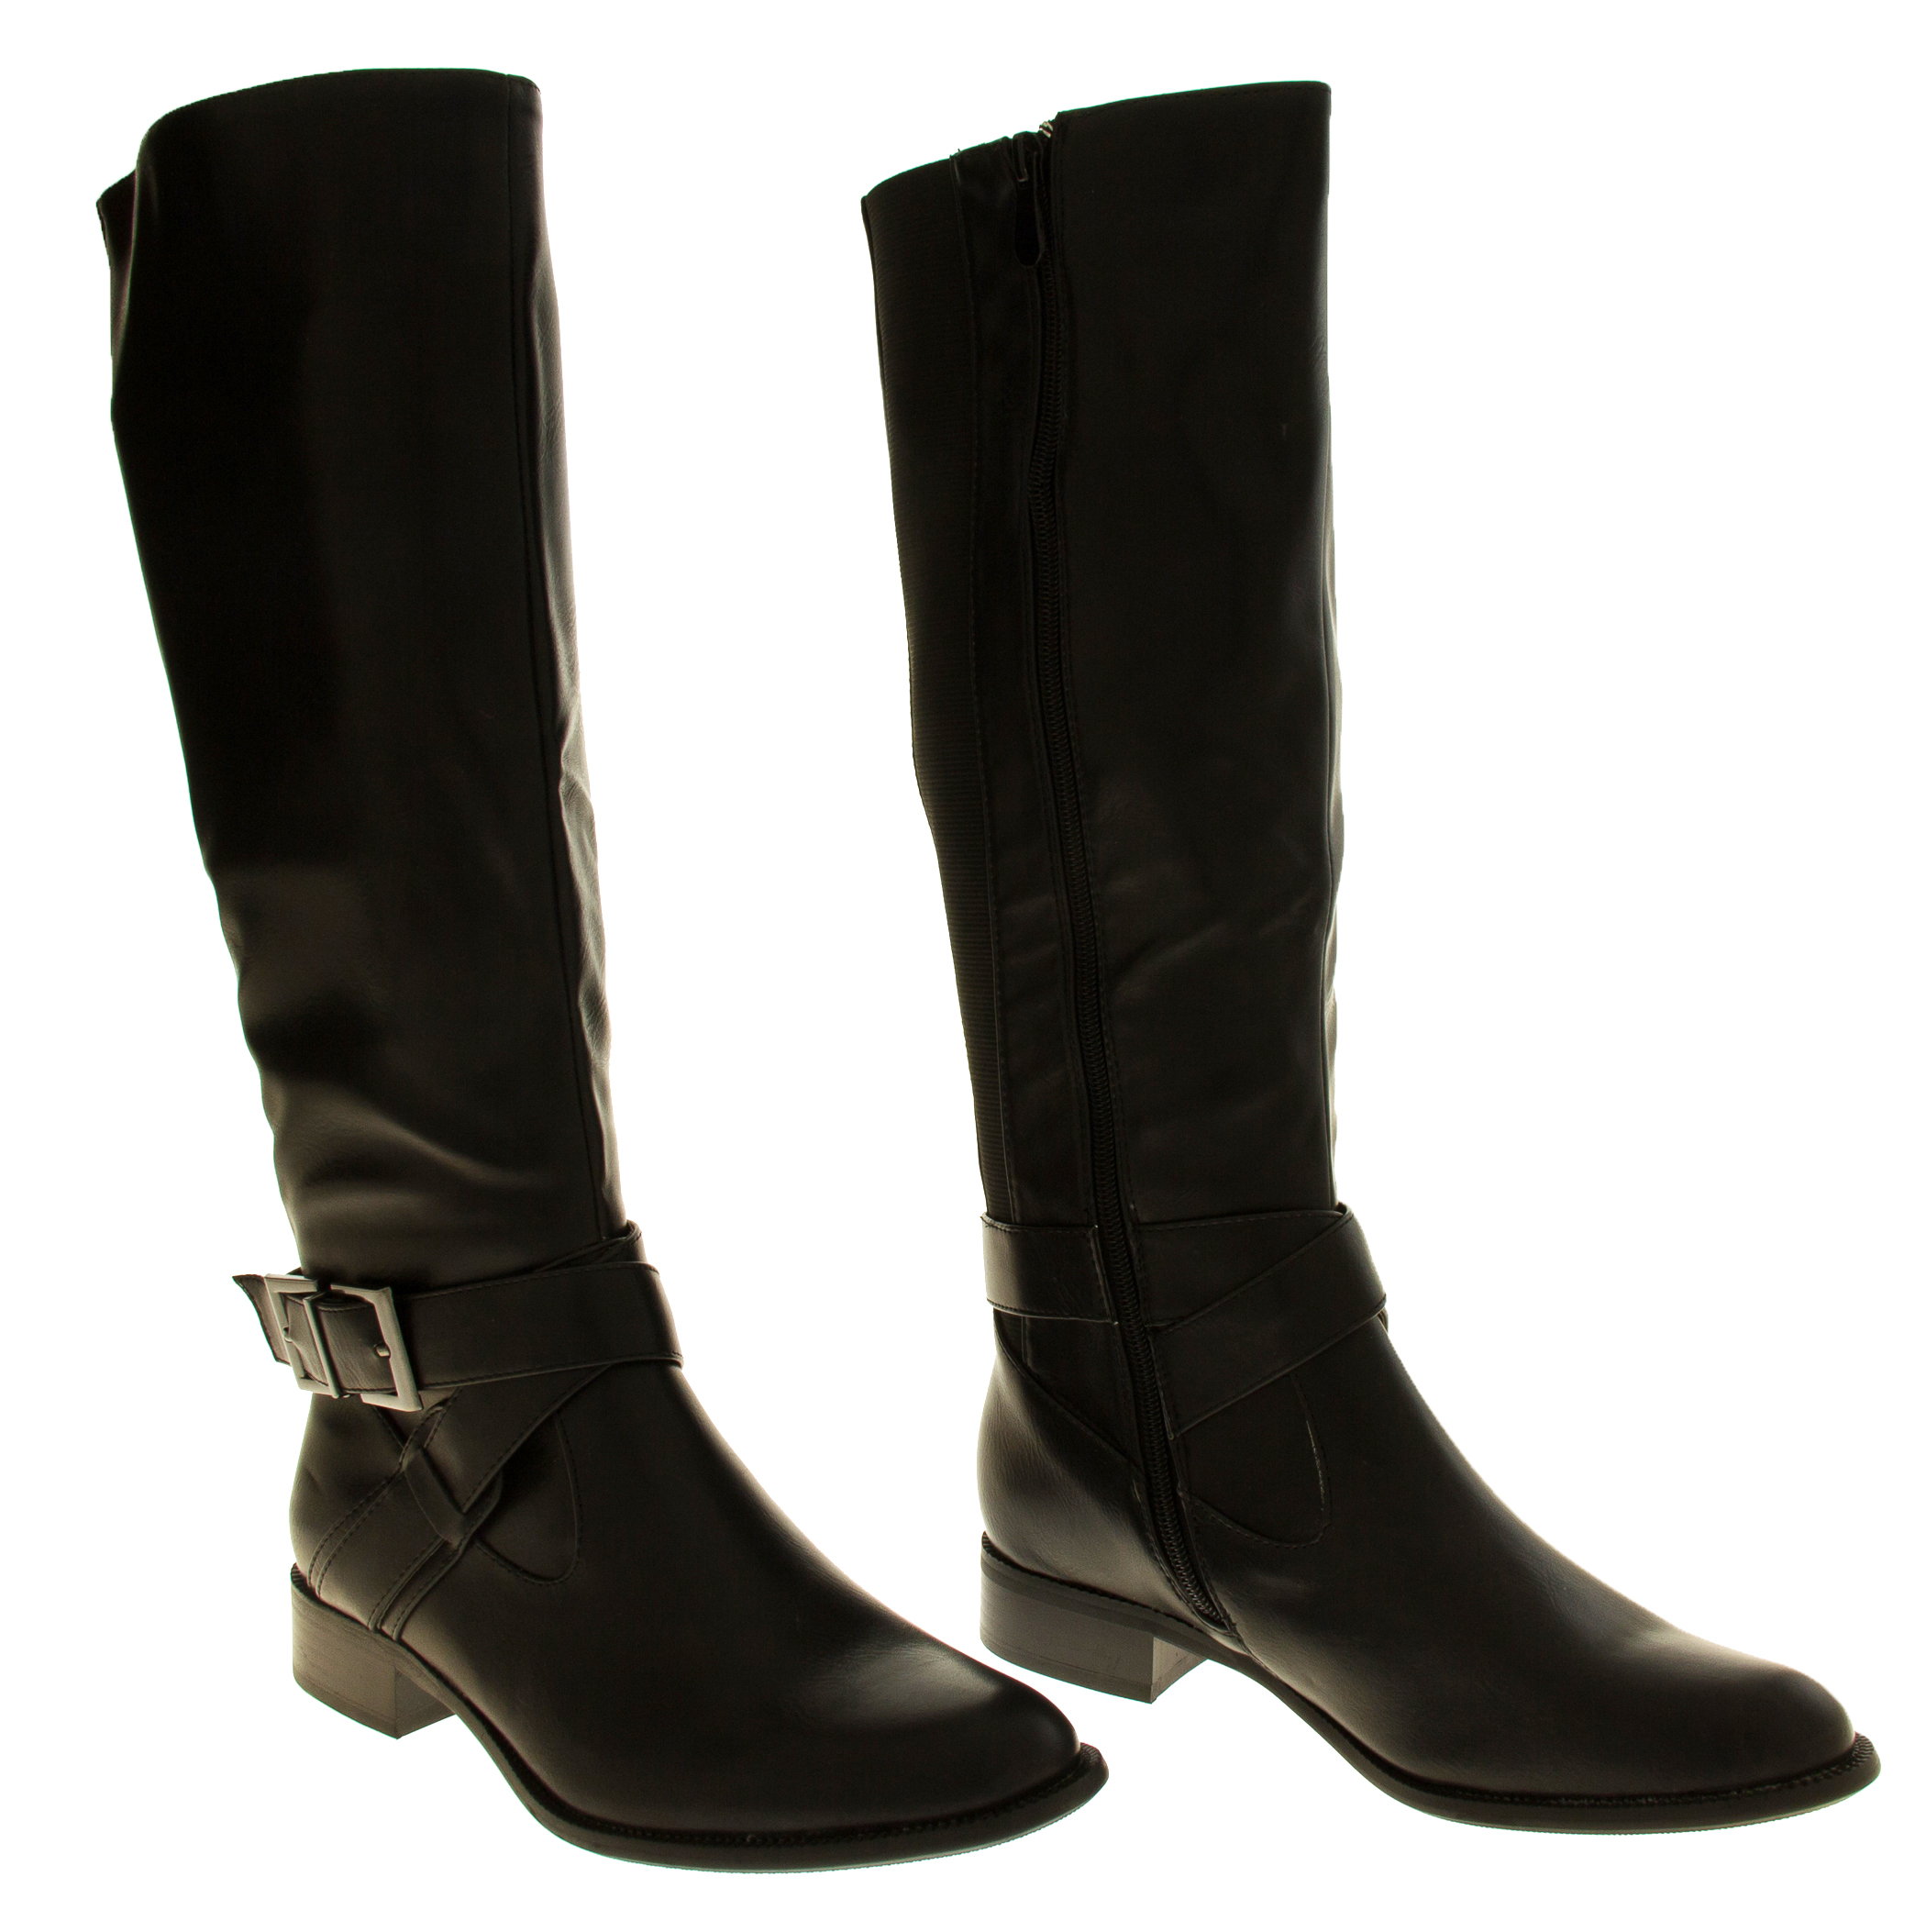 Womens Boots Low Heels Flat Knee High Work Boot Office